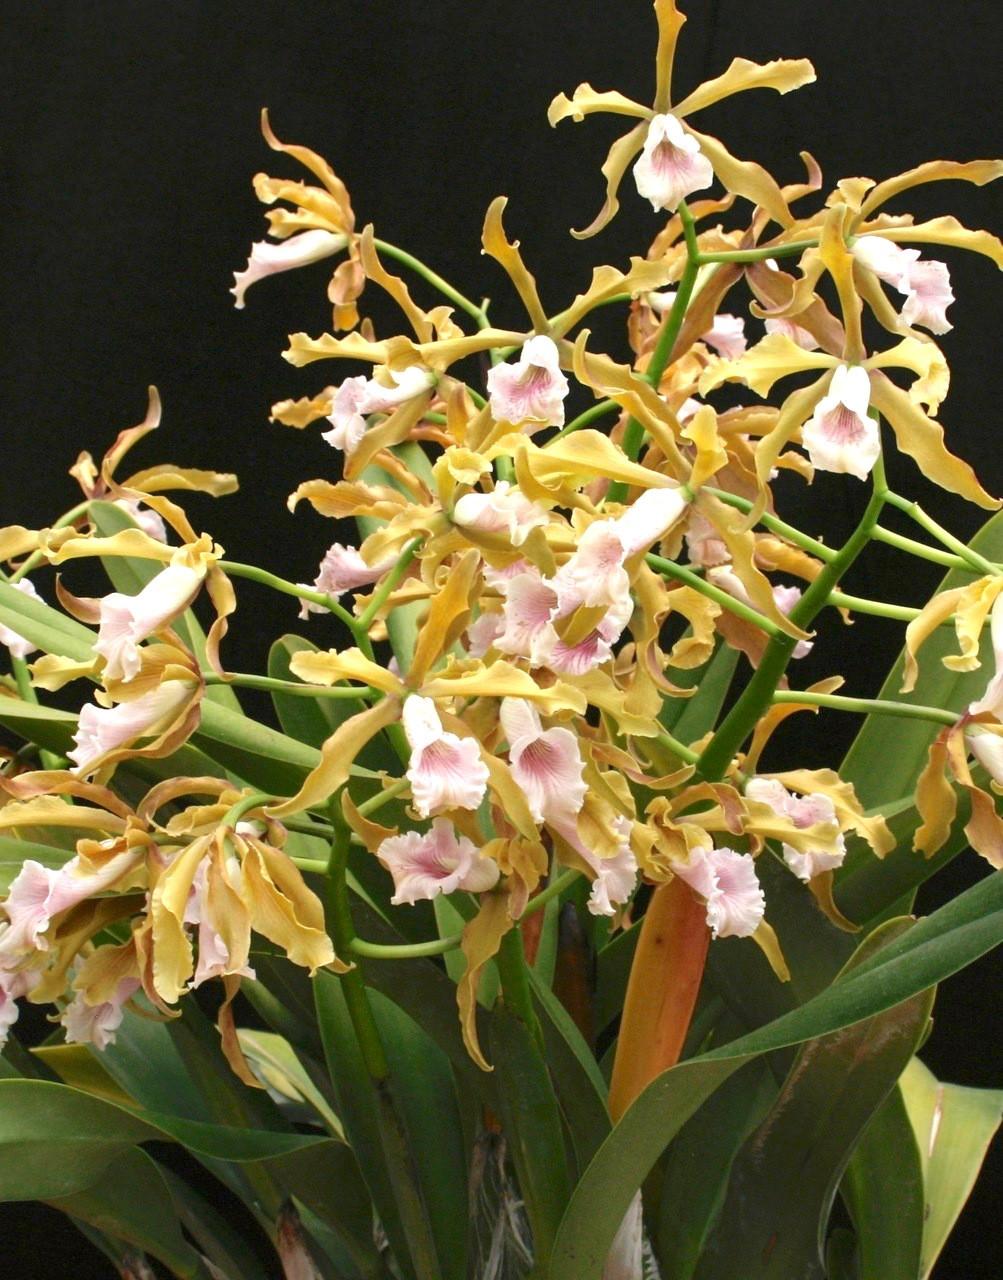 Laelia Grandis Valley Isle X Self Exotic Orchids Of Maui